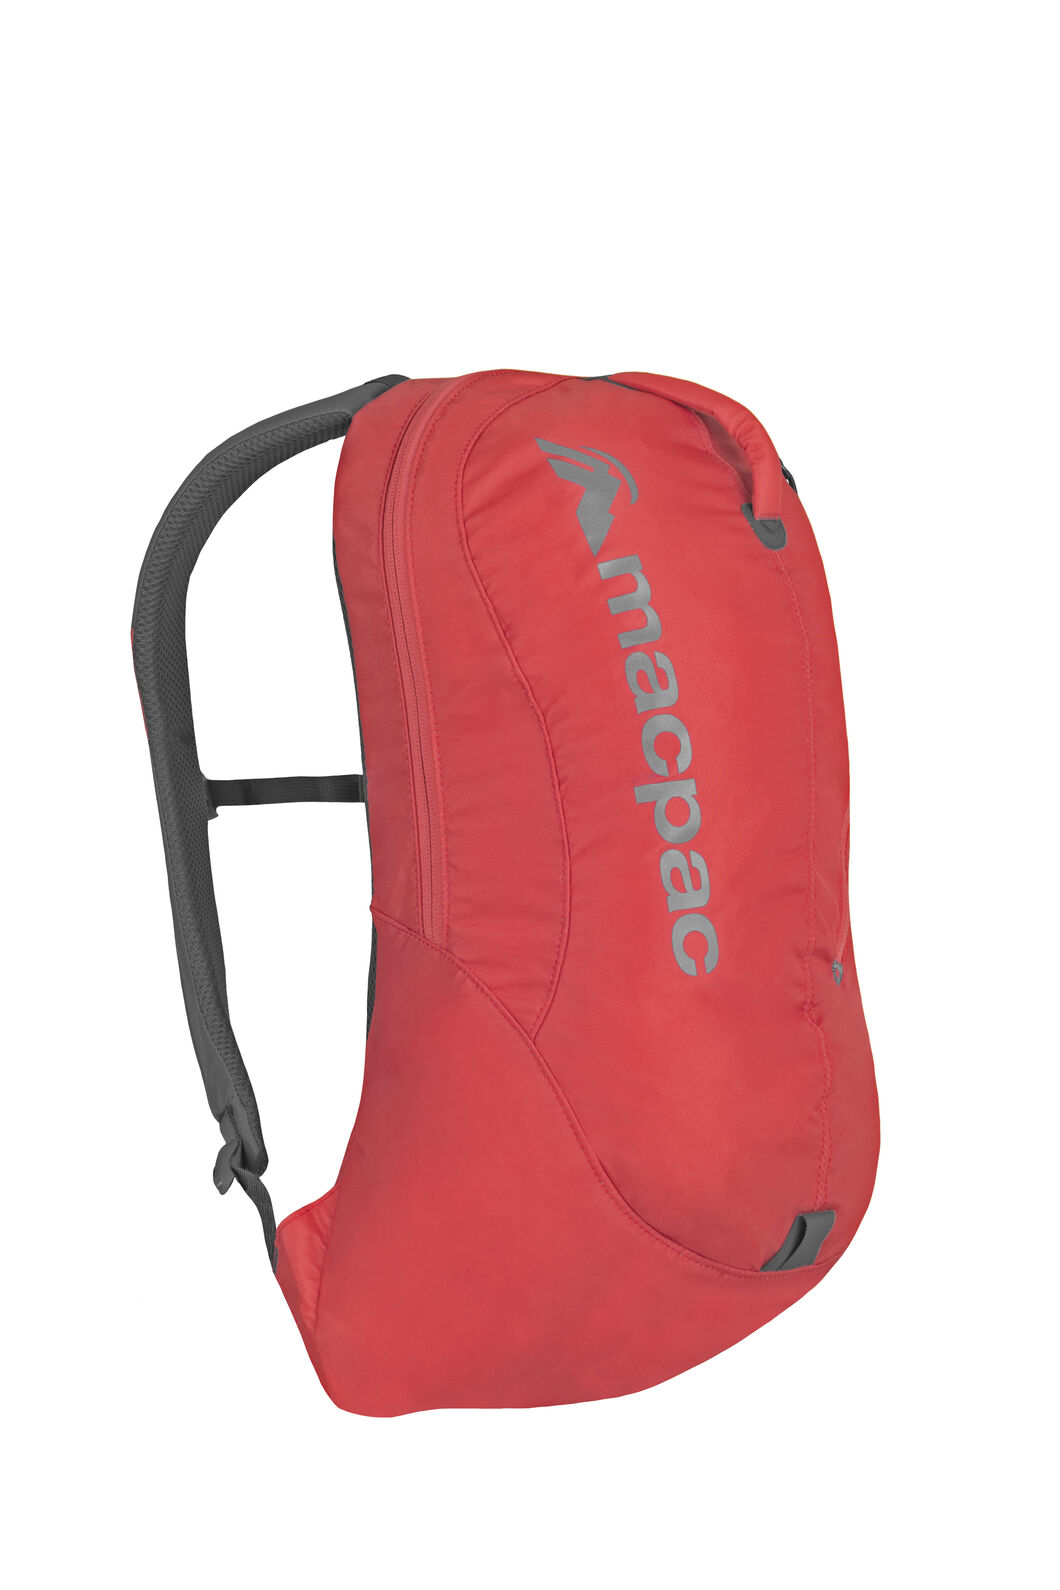 Macpac Kahuna 1.1 18L Backpack, Rose of Sharon, hi-res